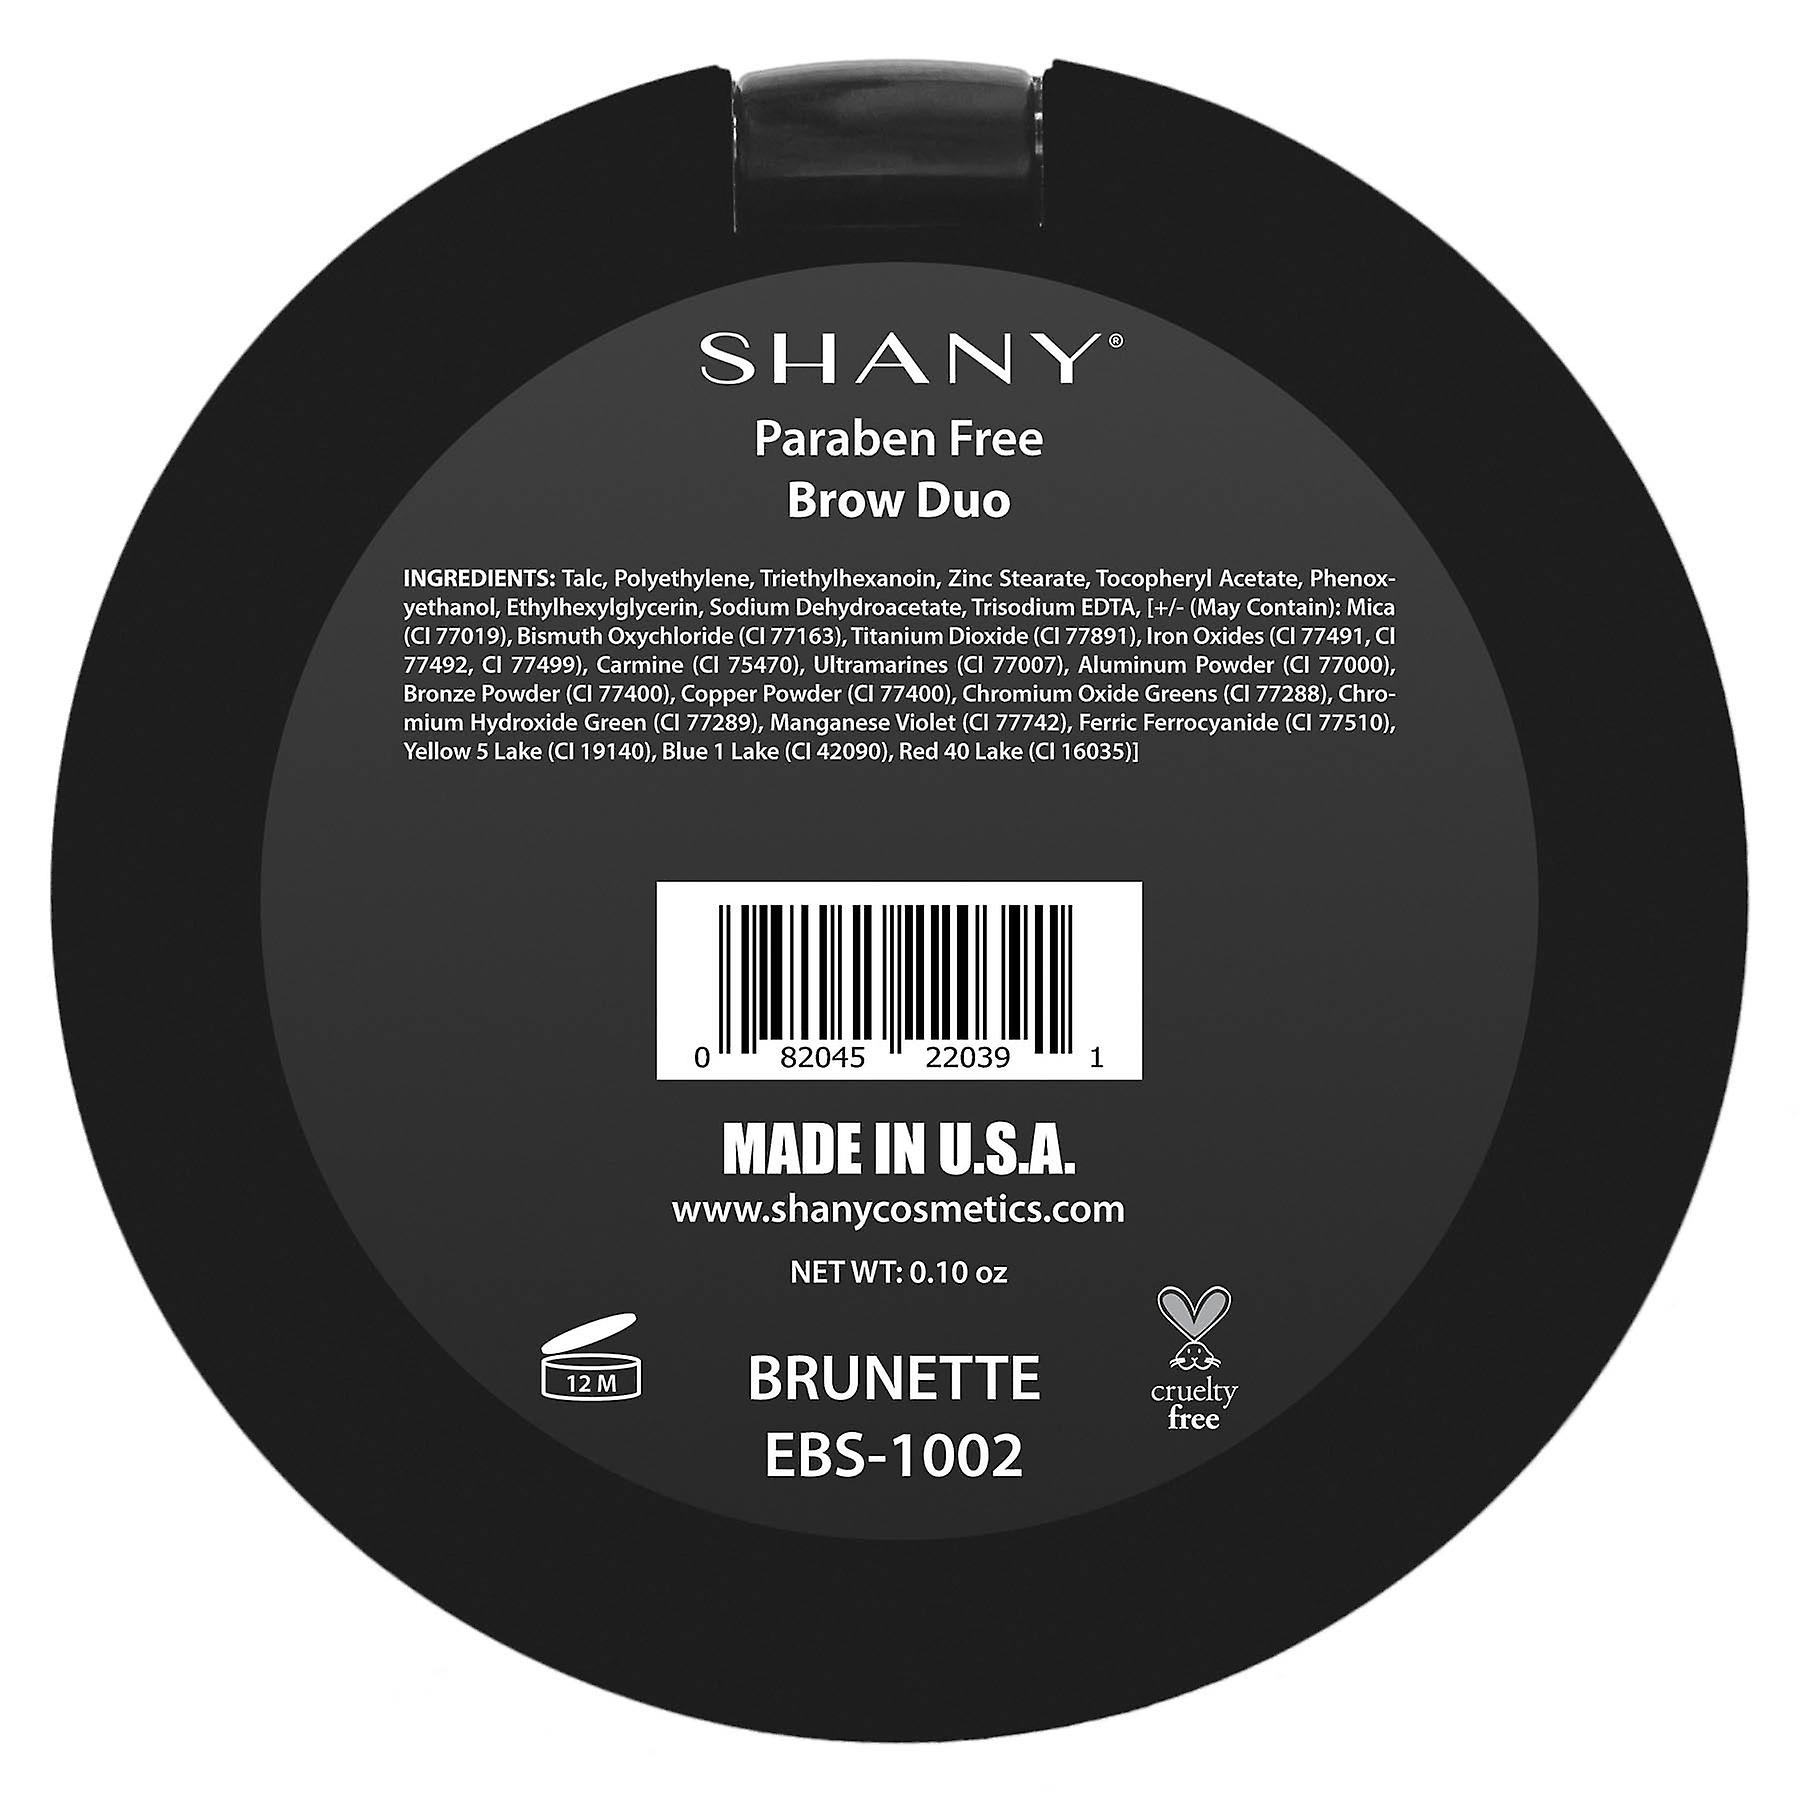 SHANY Powder Brow Duo - Paraben gratuit